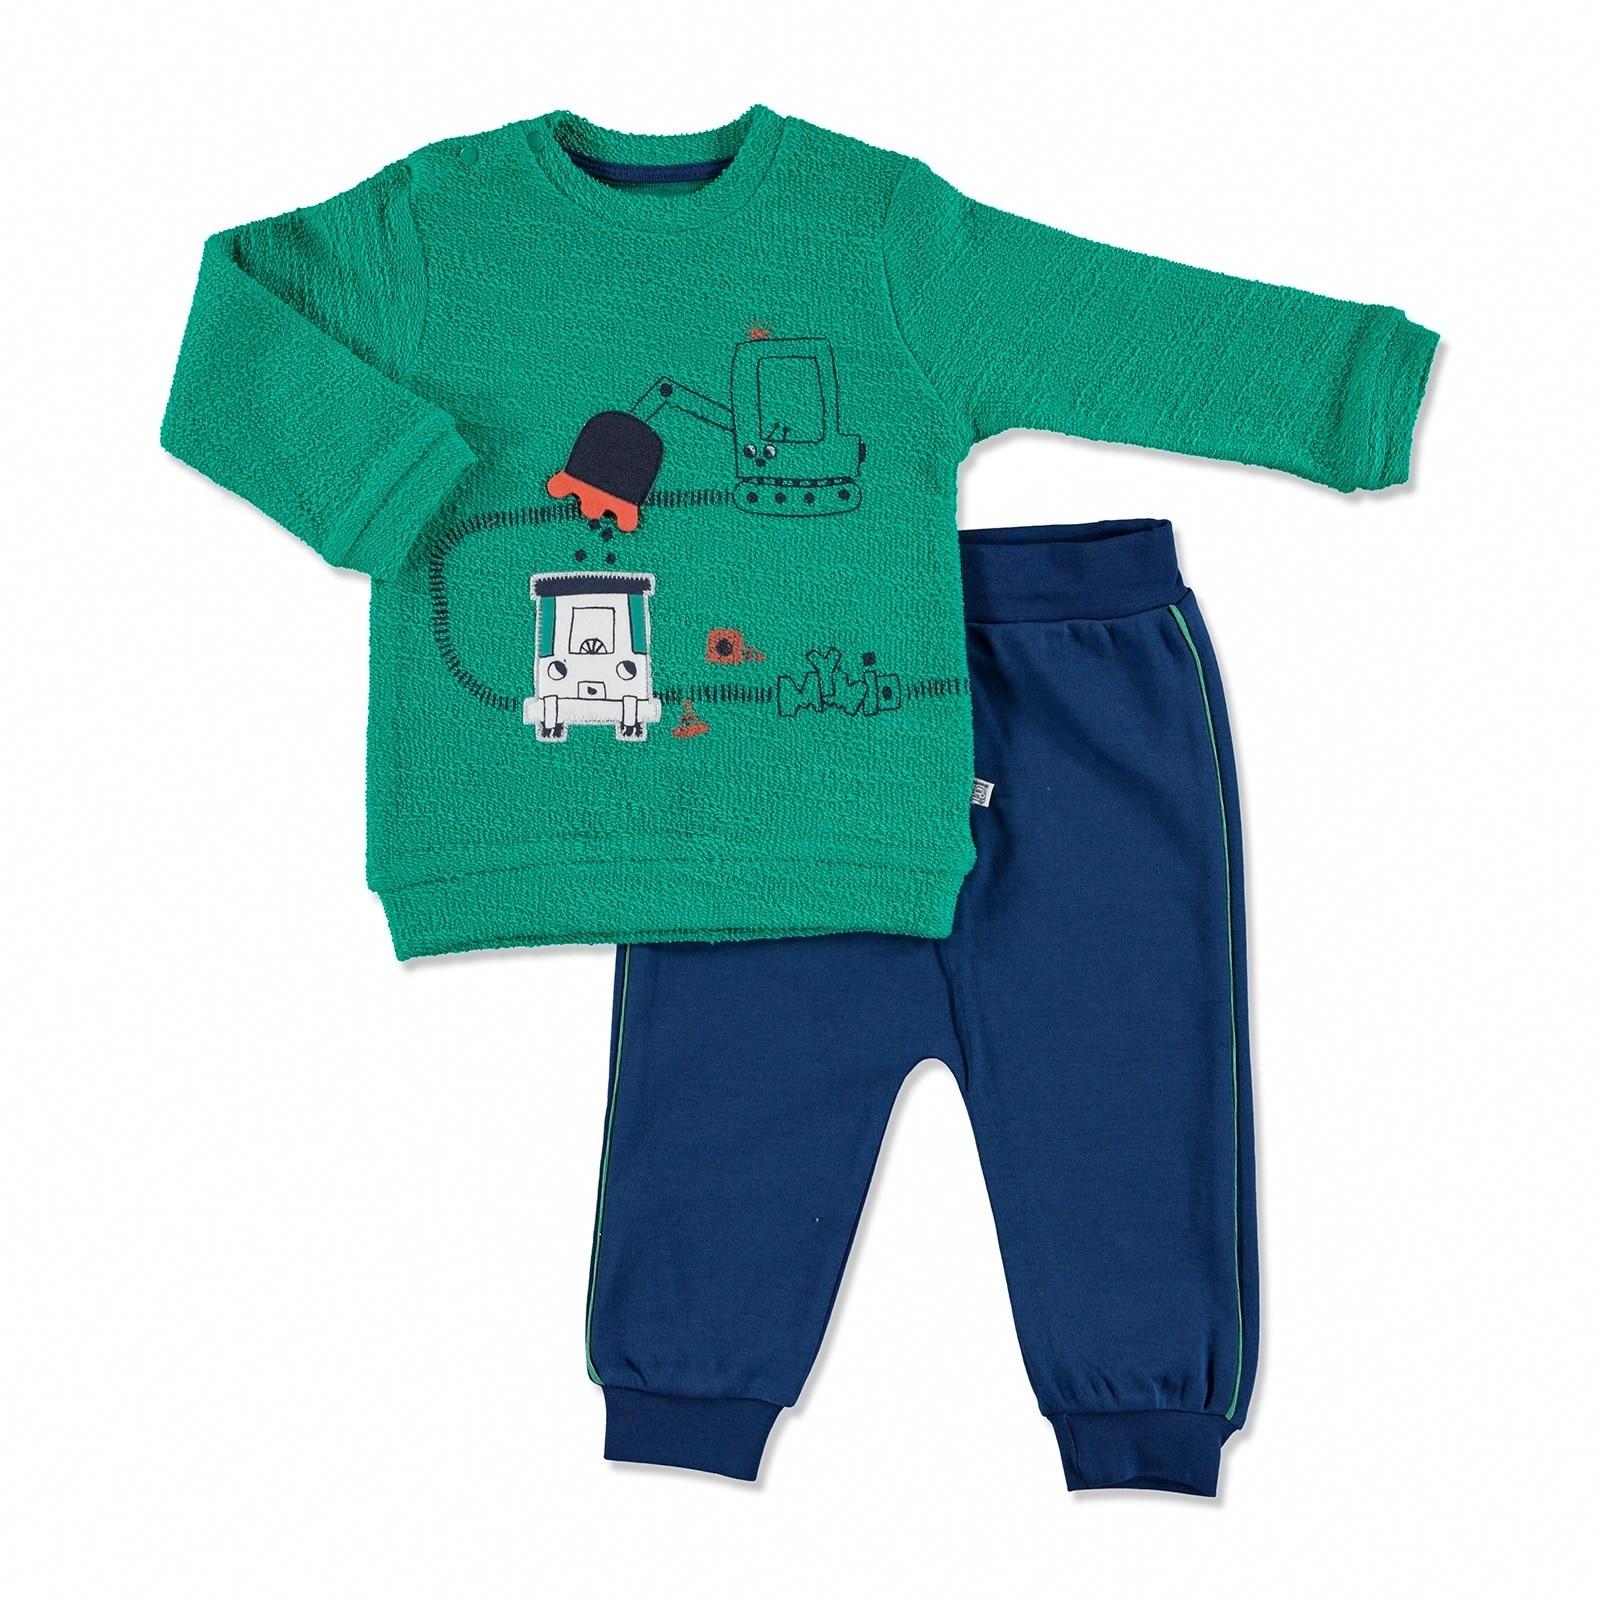 Ebebek Mymio Summer Baby Boy Scoop Long Sleeve Footless Sweatshirt